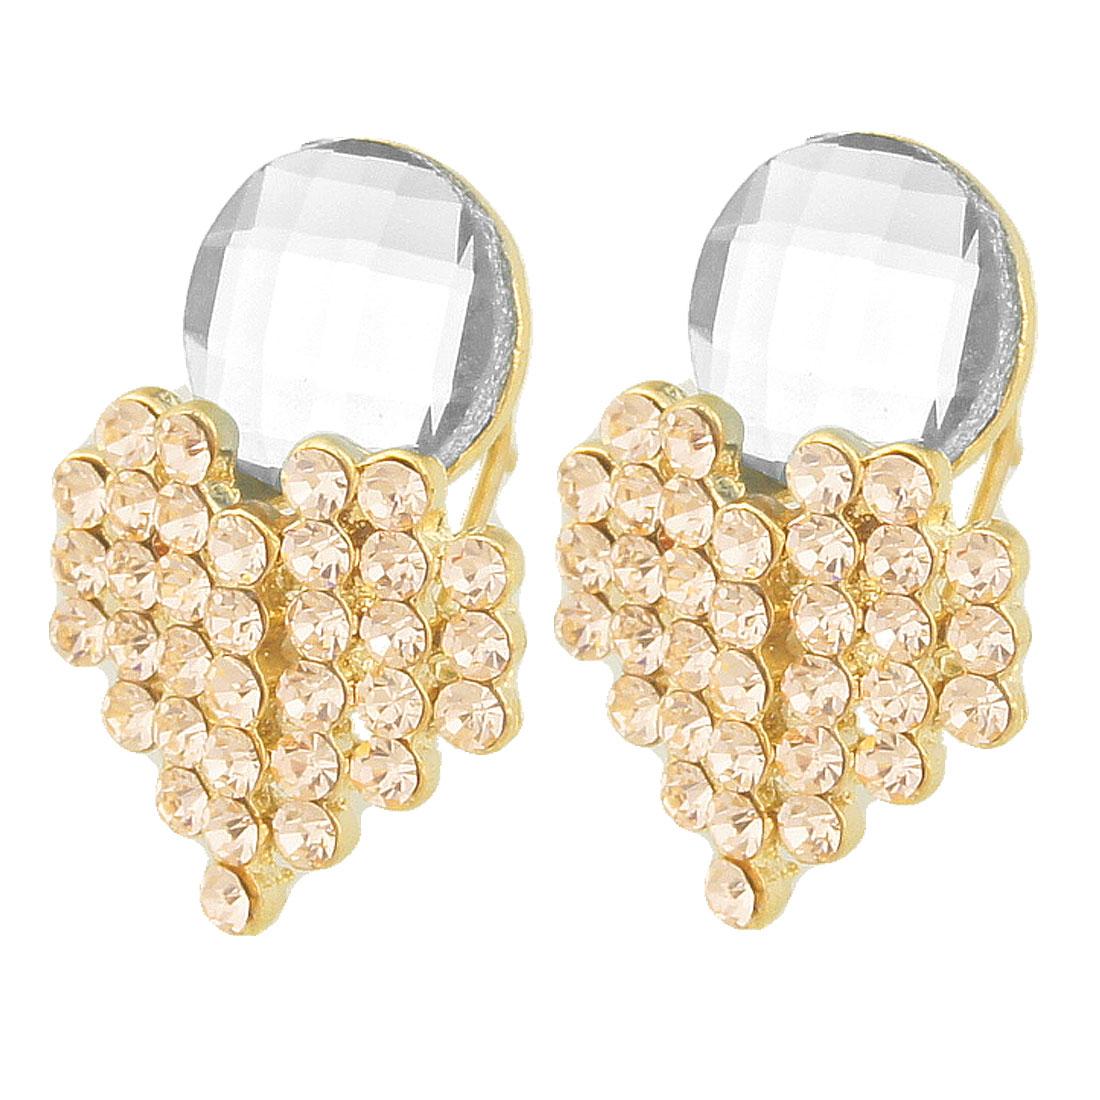 Woman Rhinestone Decor Clear Crystal Earbob Pierced Earrings Pair